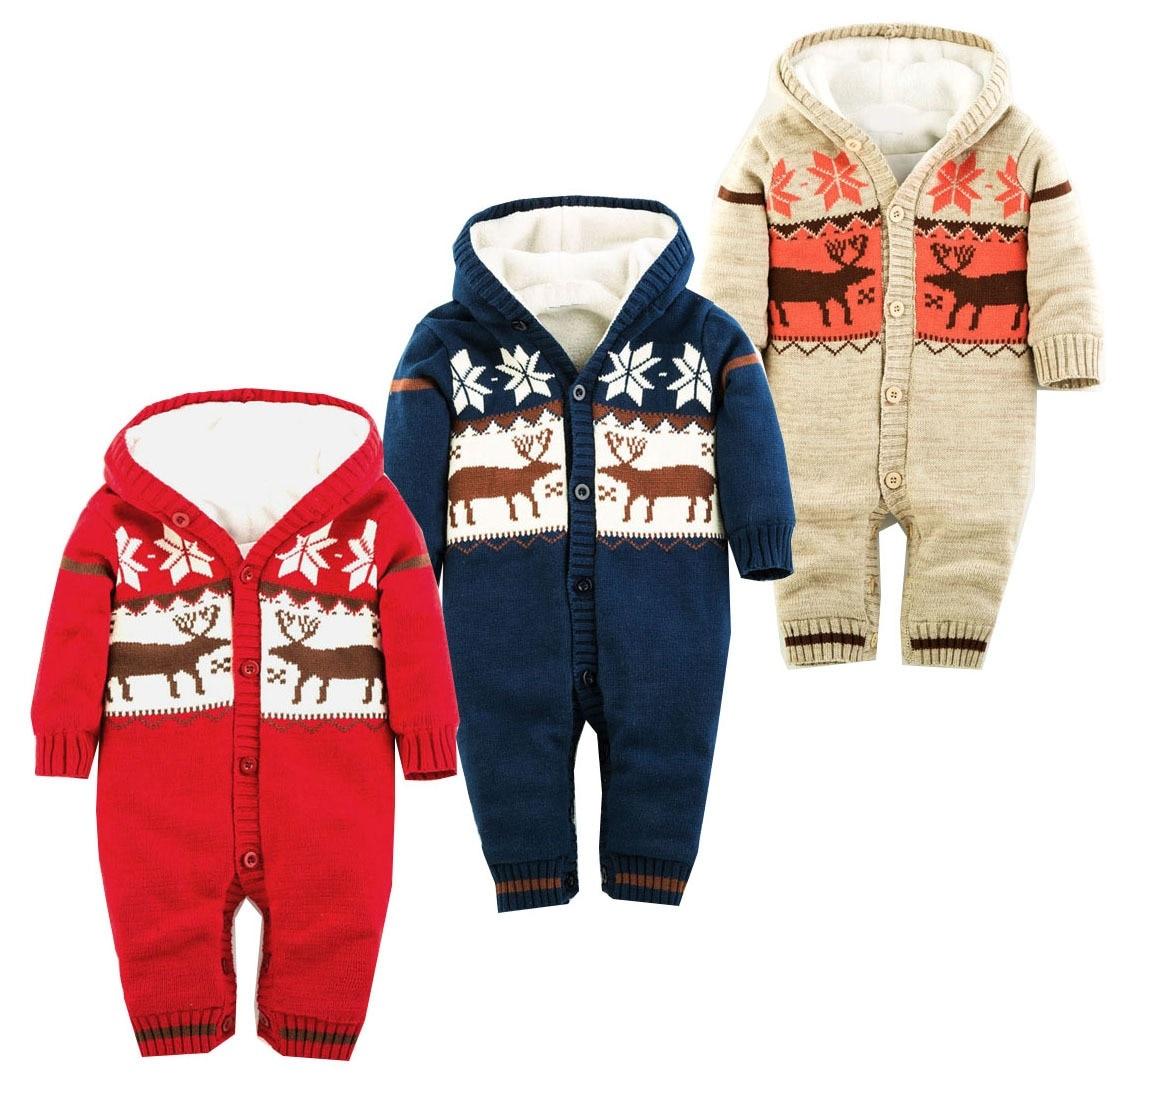 Plus Velvet Winter Warm Baby Boy Romper Brand Deer Printed Hooded Baby Girl Romper For 0-18M Baby Costume Newborn Clothing<br>